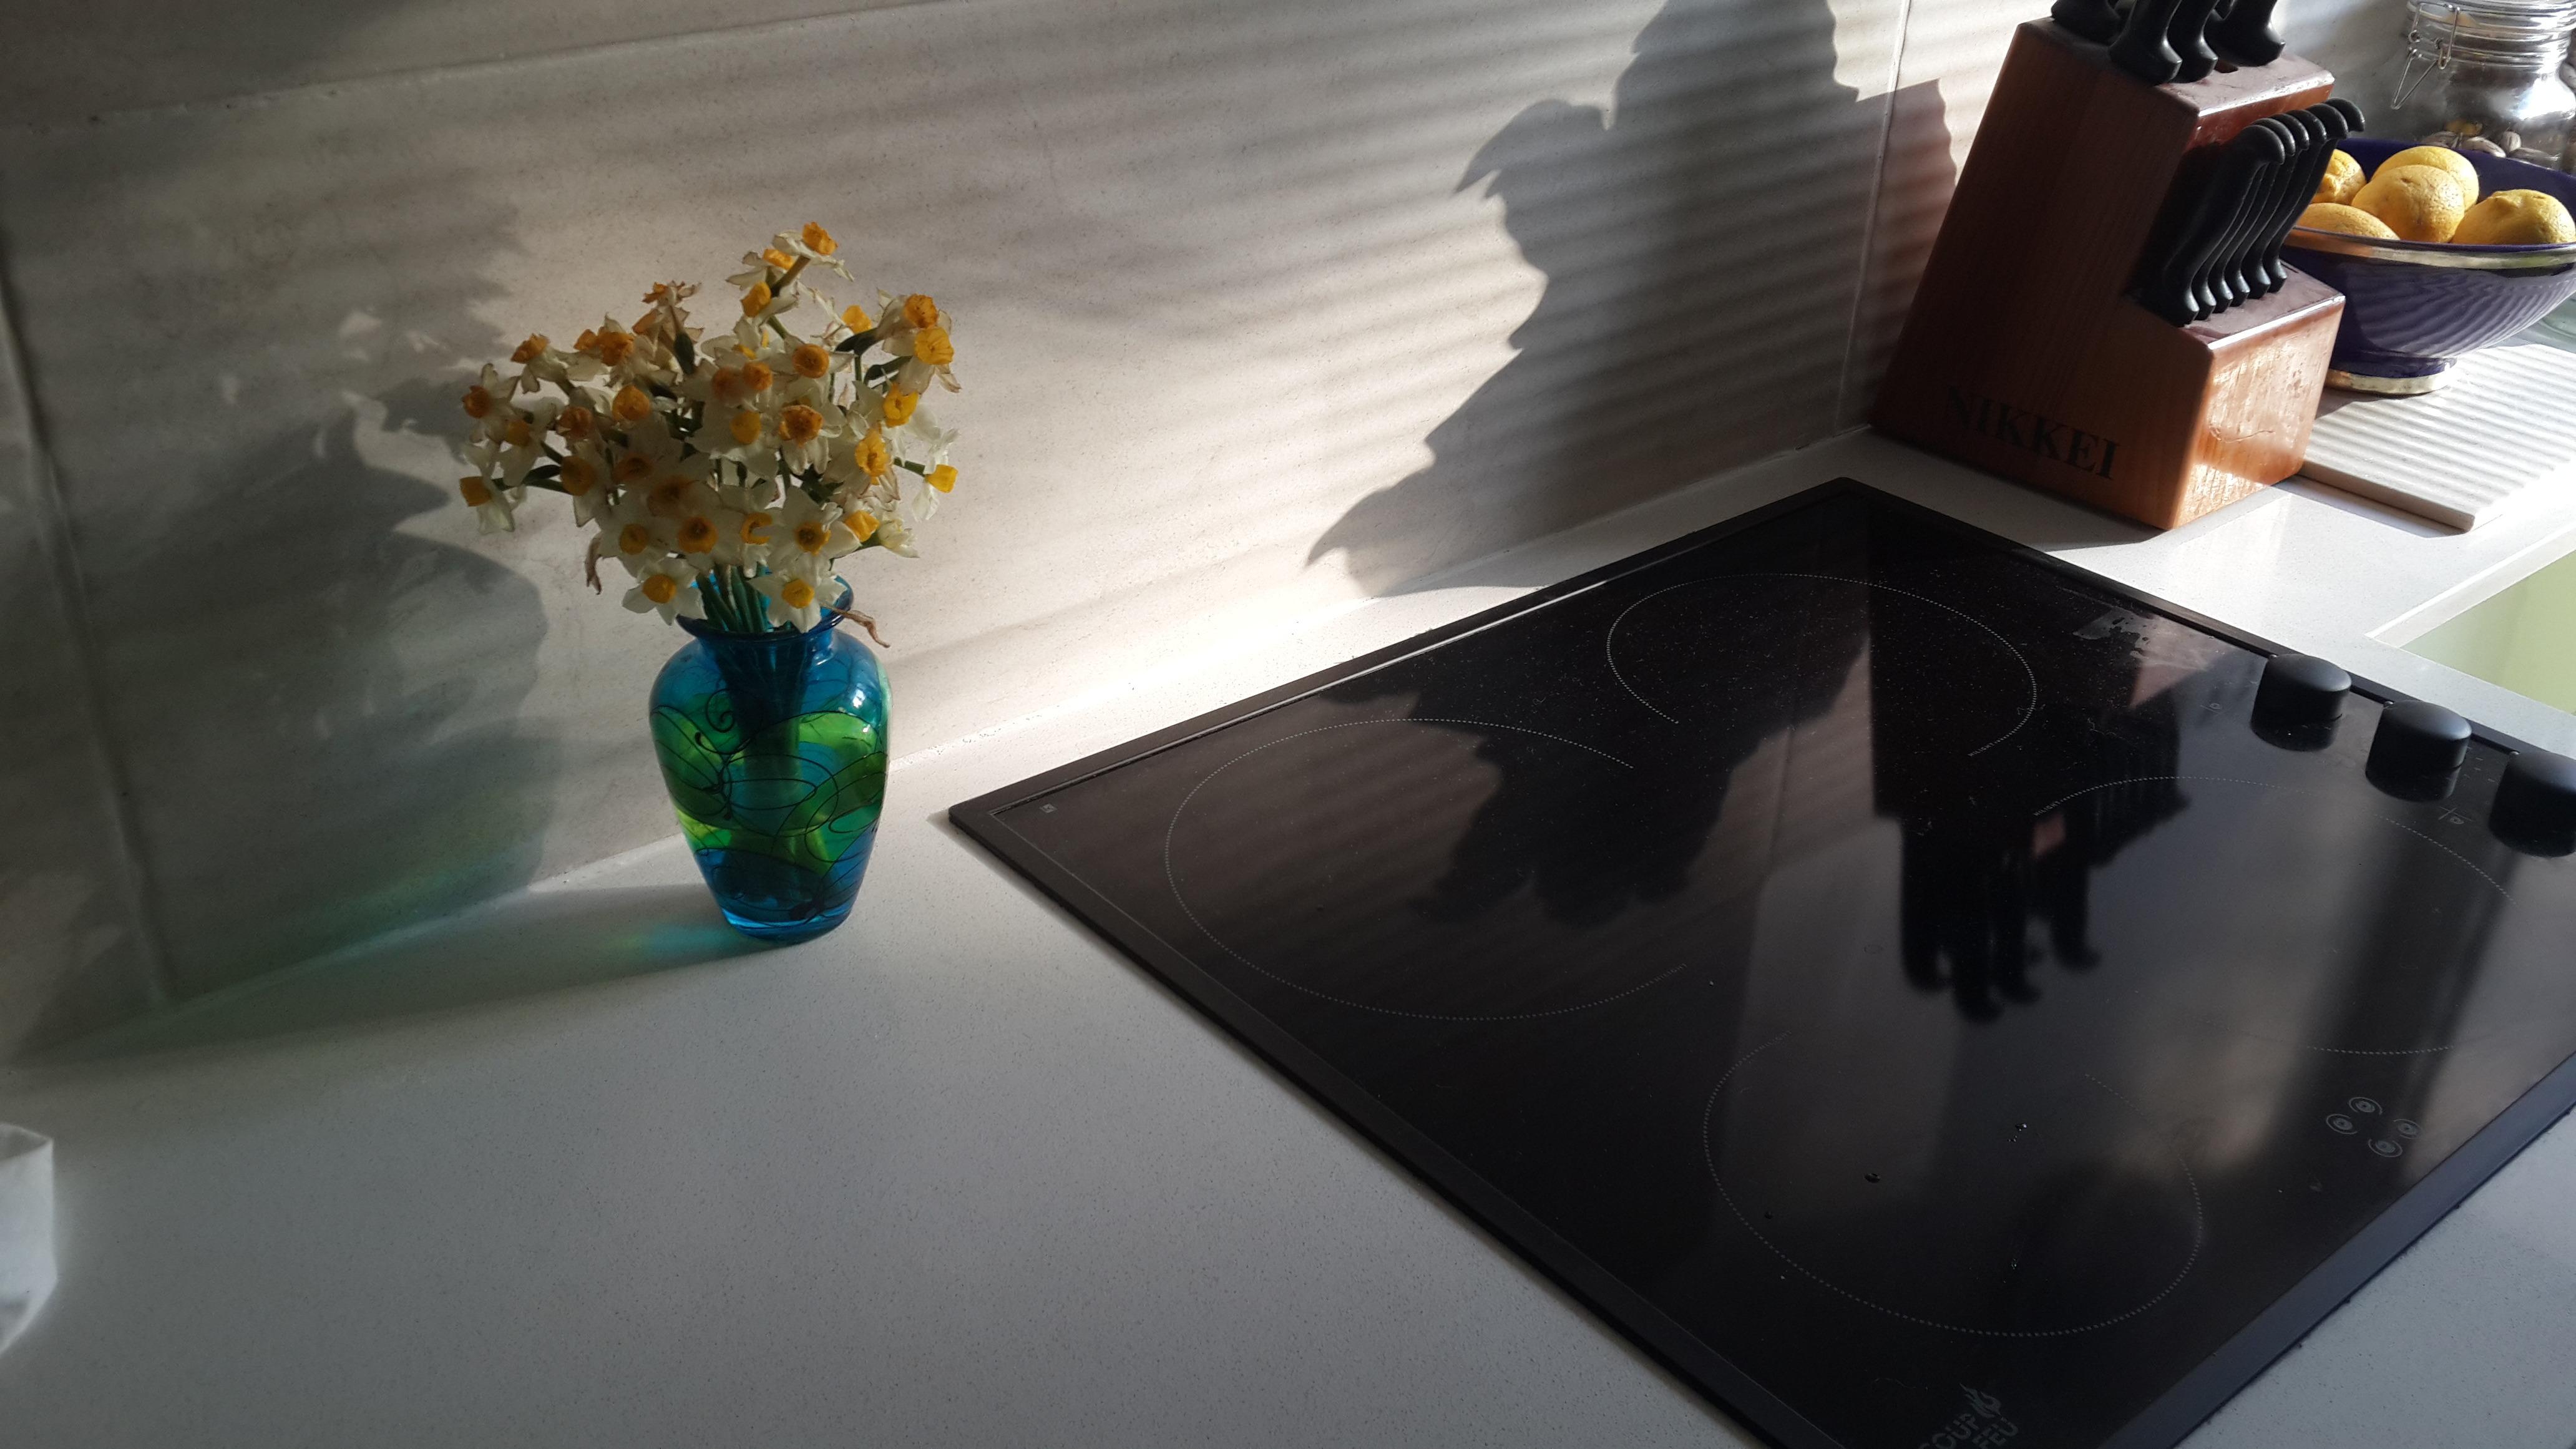 Gambar Kaca Memasak Dapur Tempat Tinggal Modern Kompor